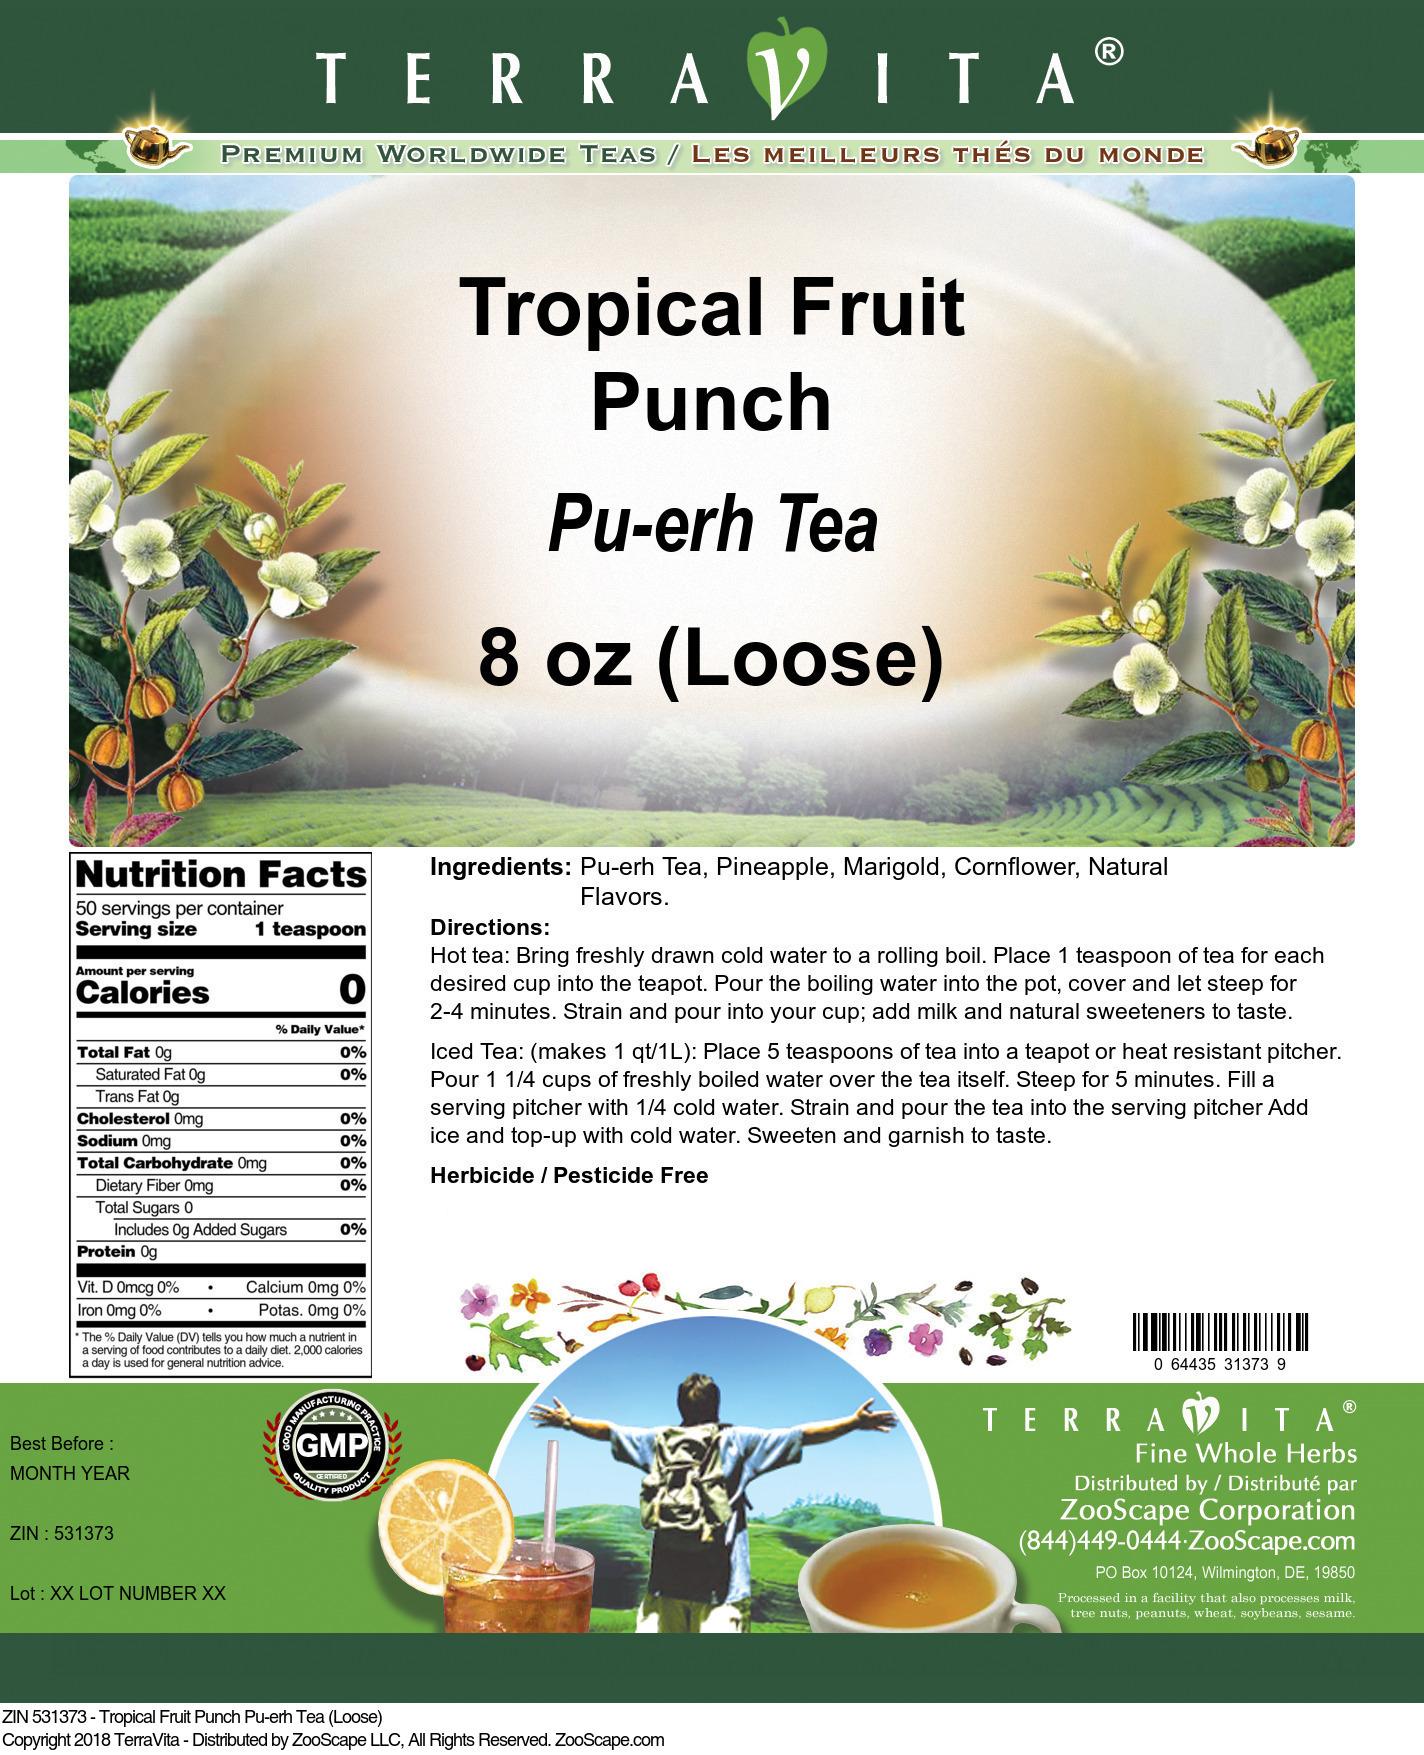 Tropical Fruit Punch Pu-erh Tea